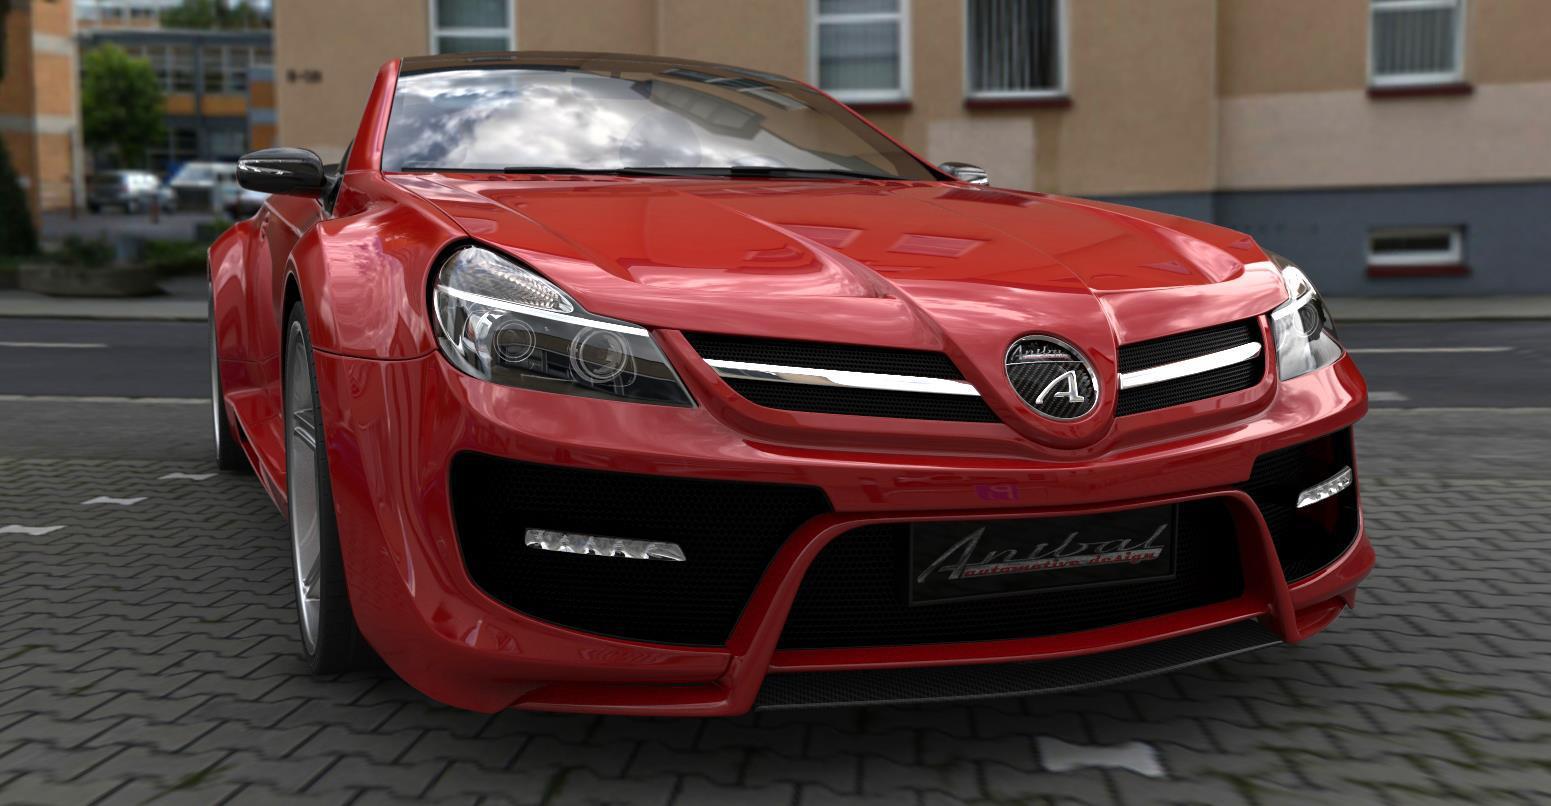 Anibal Automotive создаст собственный спорткар набазе Порш 911 Turbo S